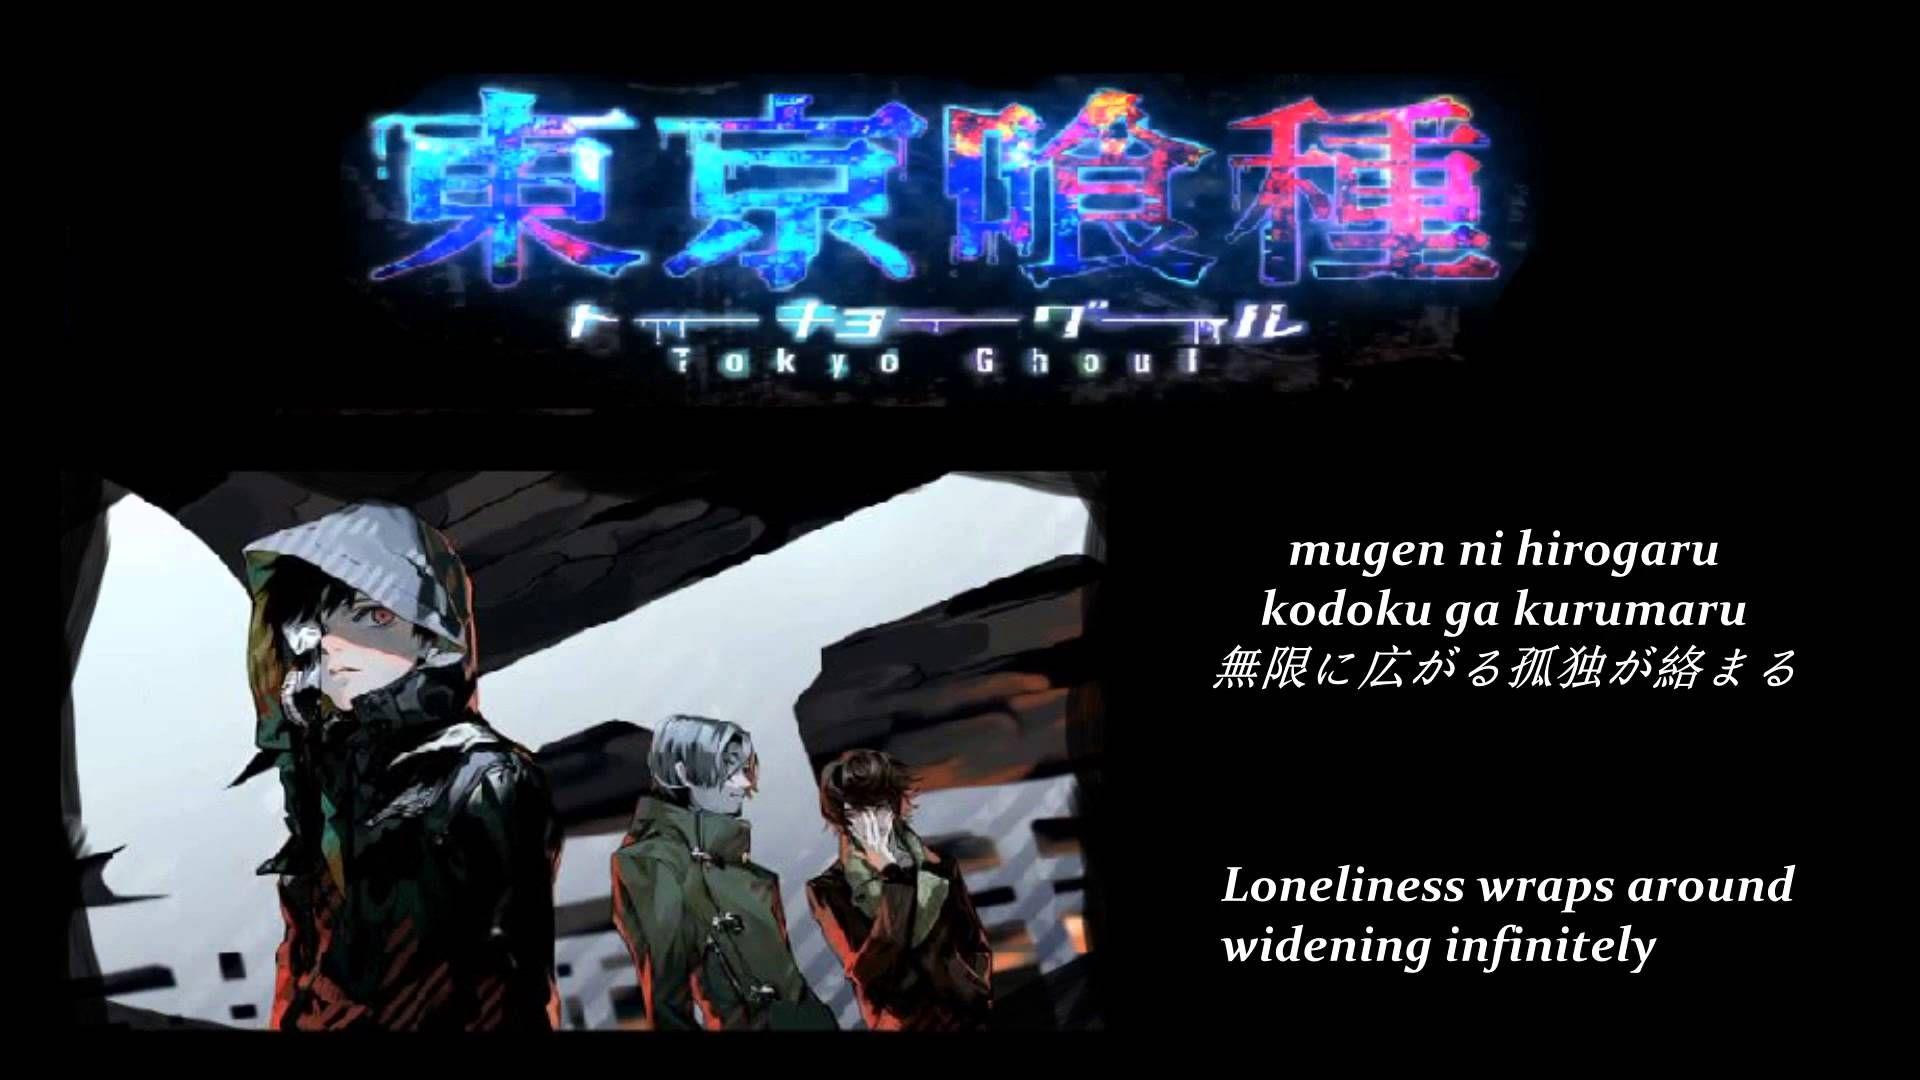 Tokyo Ghoul op [Unravel] - Karaoke (off vocal) -- AliceIsWho